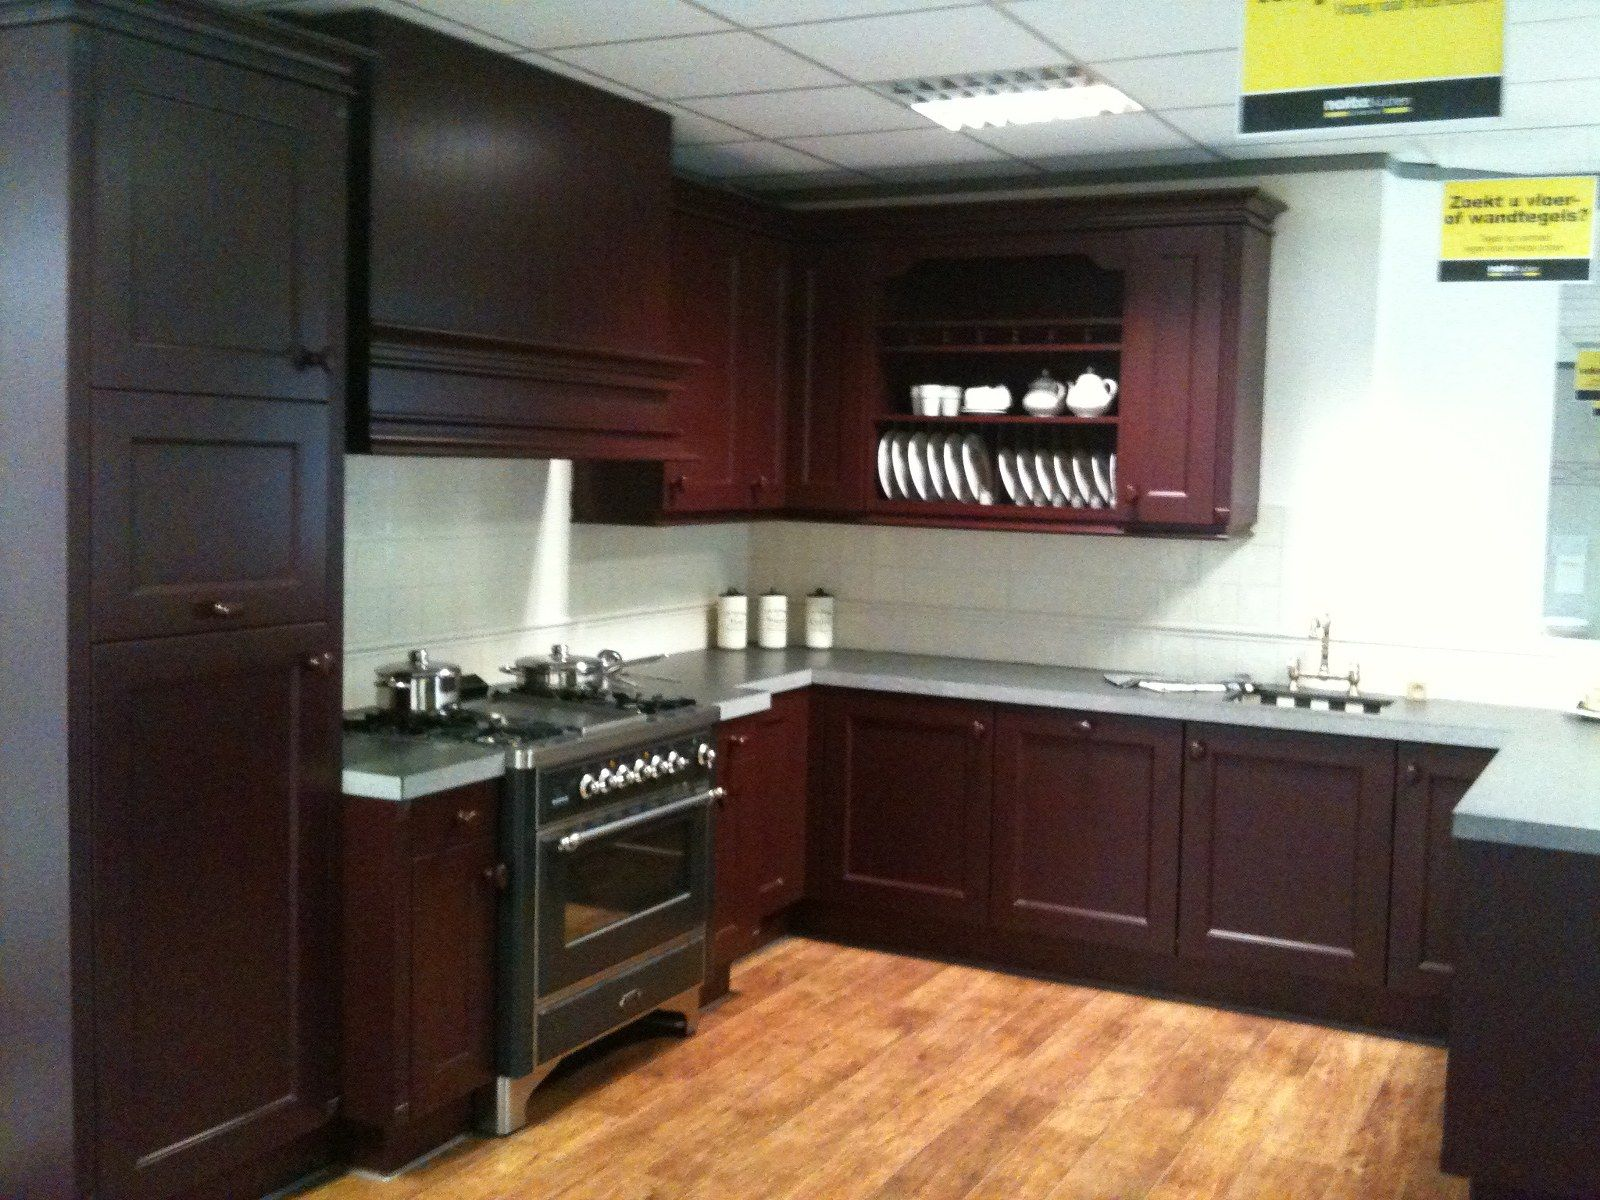 Keuken Bordeaux Rood : keukens voor zeer lage keuken prijzen showroomkeuken bordeaux rood